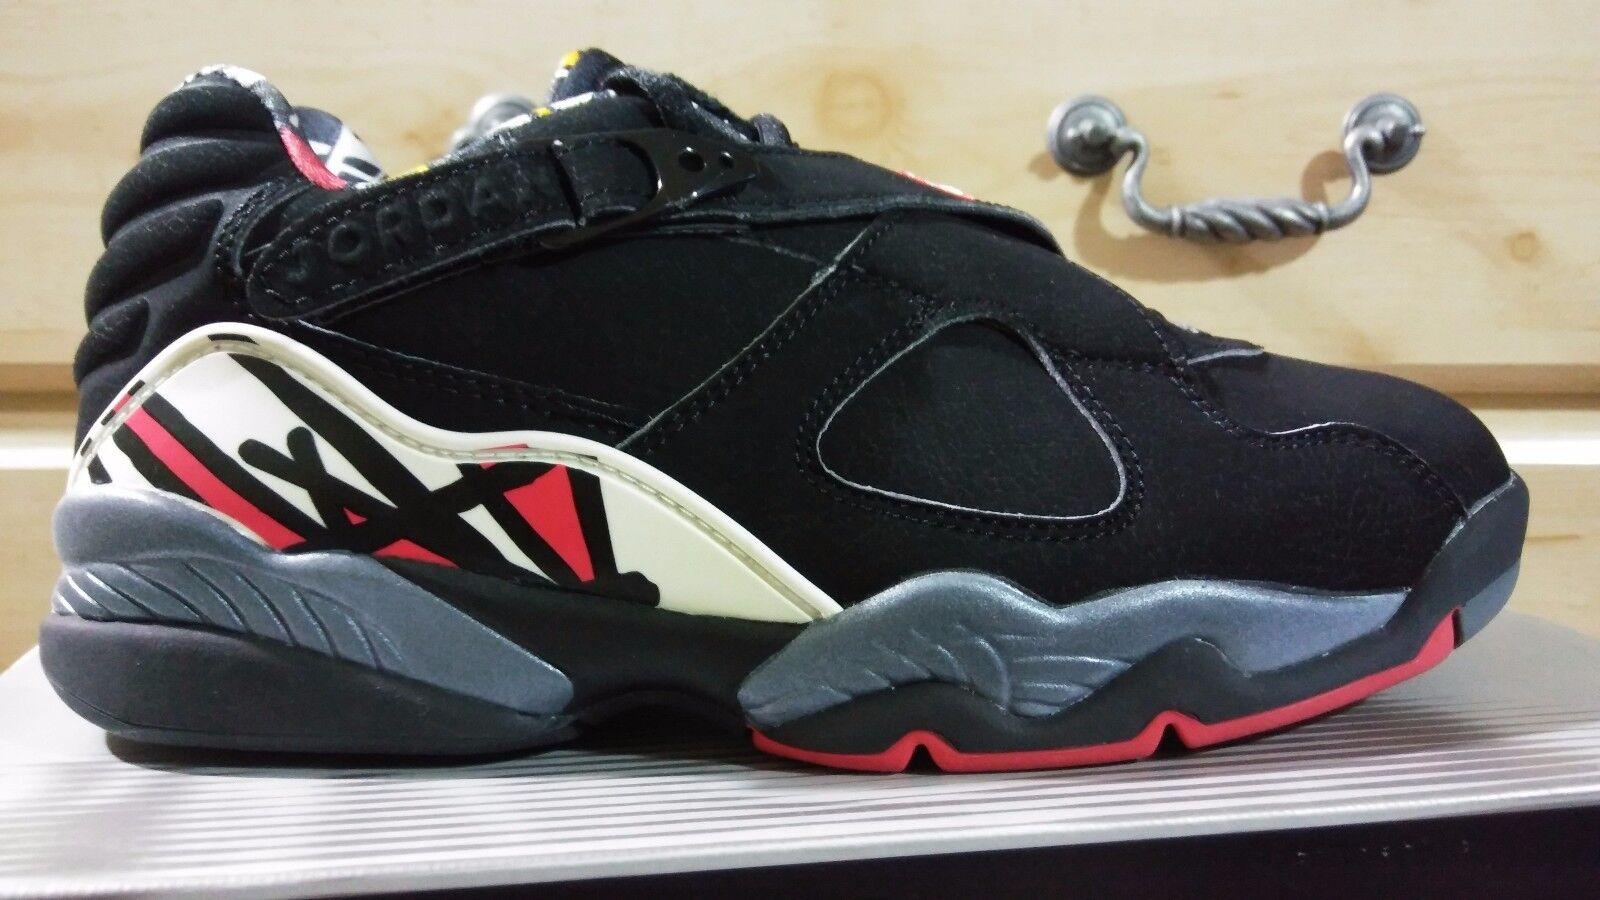 Nike air jordan 8 retrò basso Uomo sz nero / vero red-del sol nwb tutti i suede